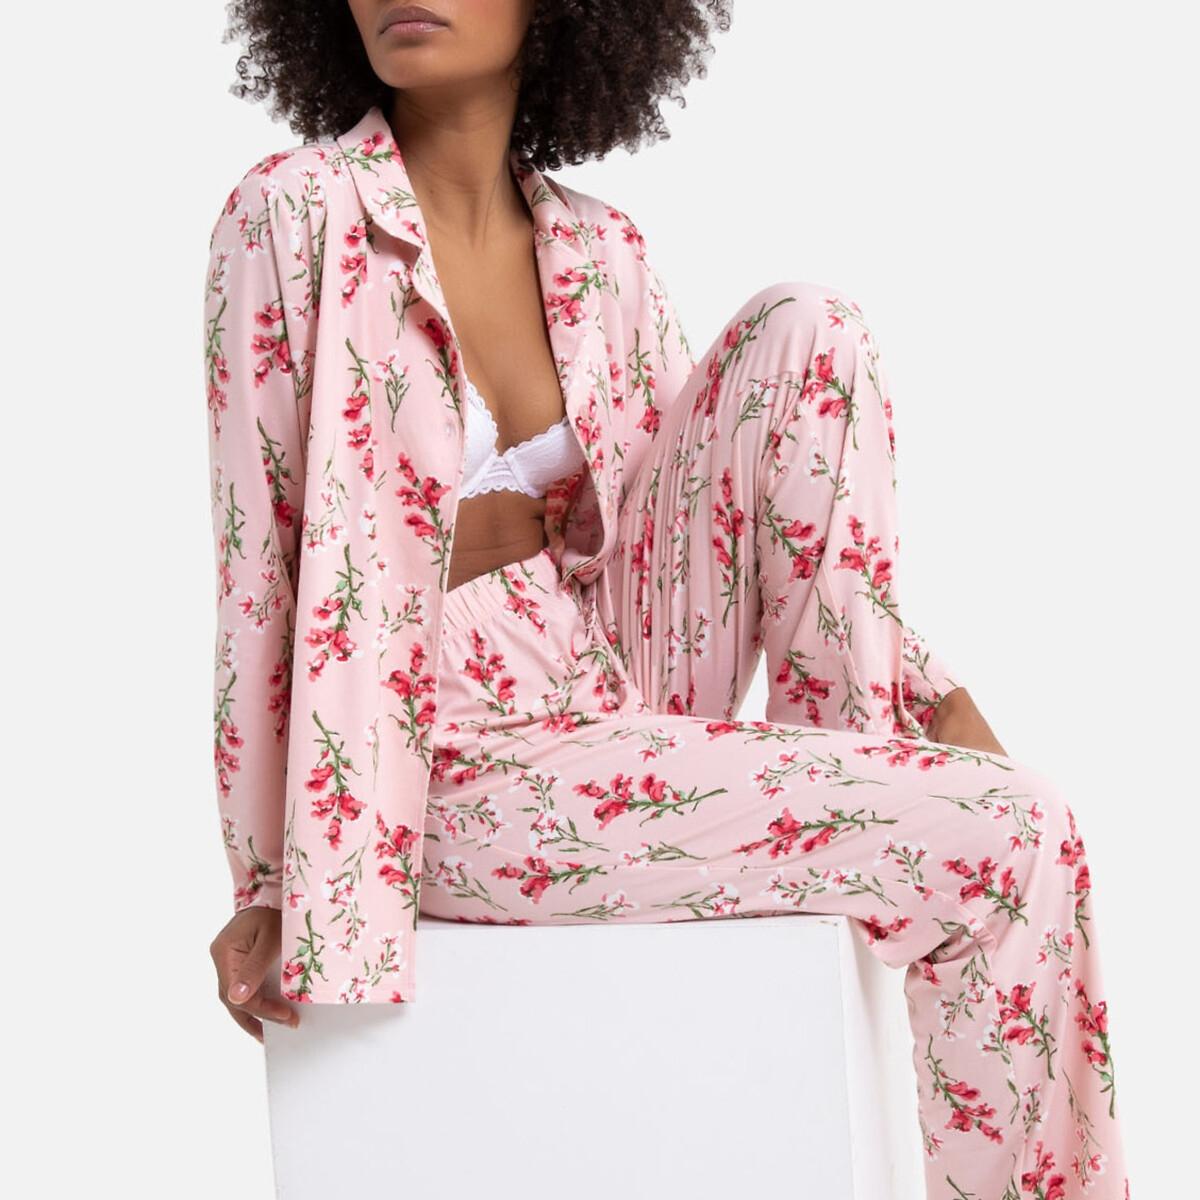 Pijama de punto suave estampado